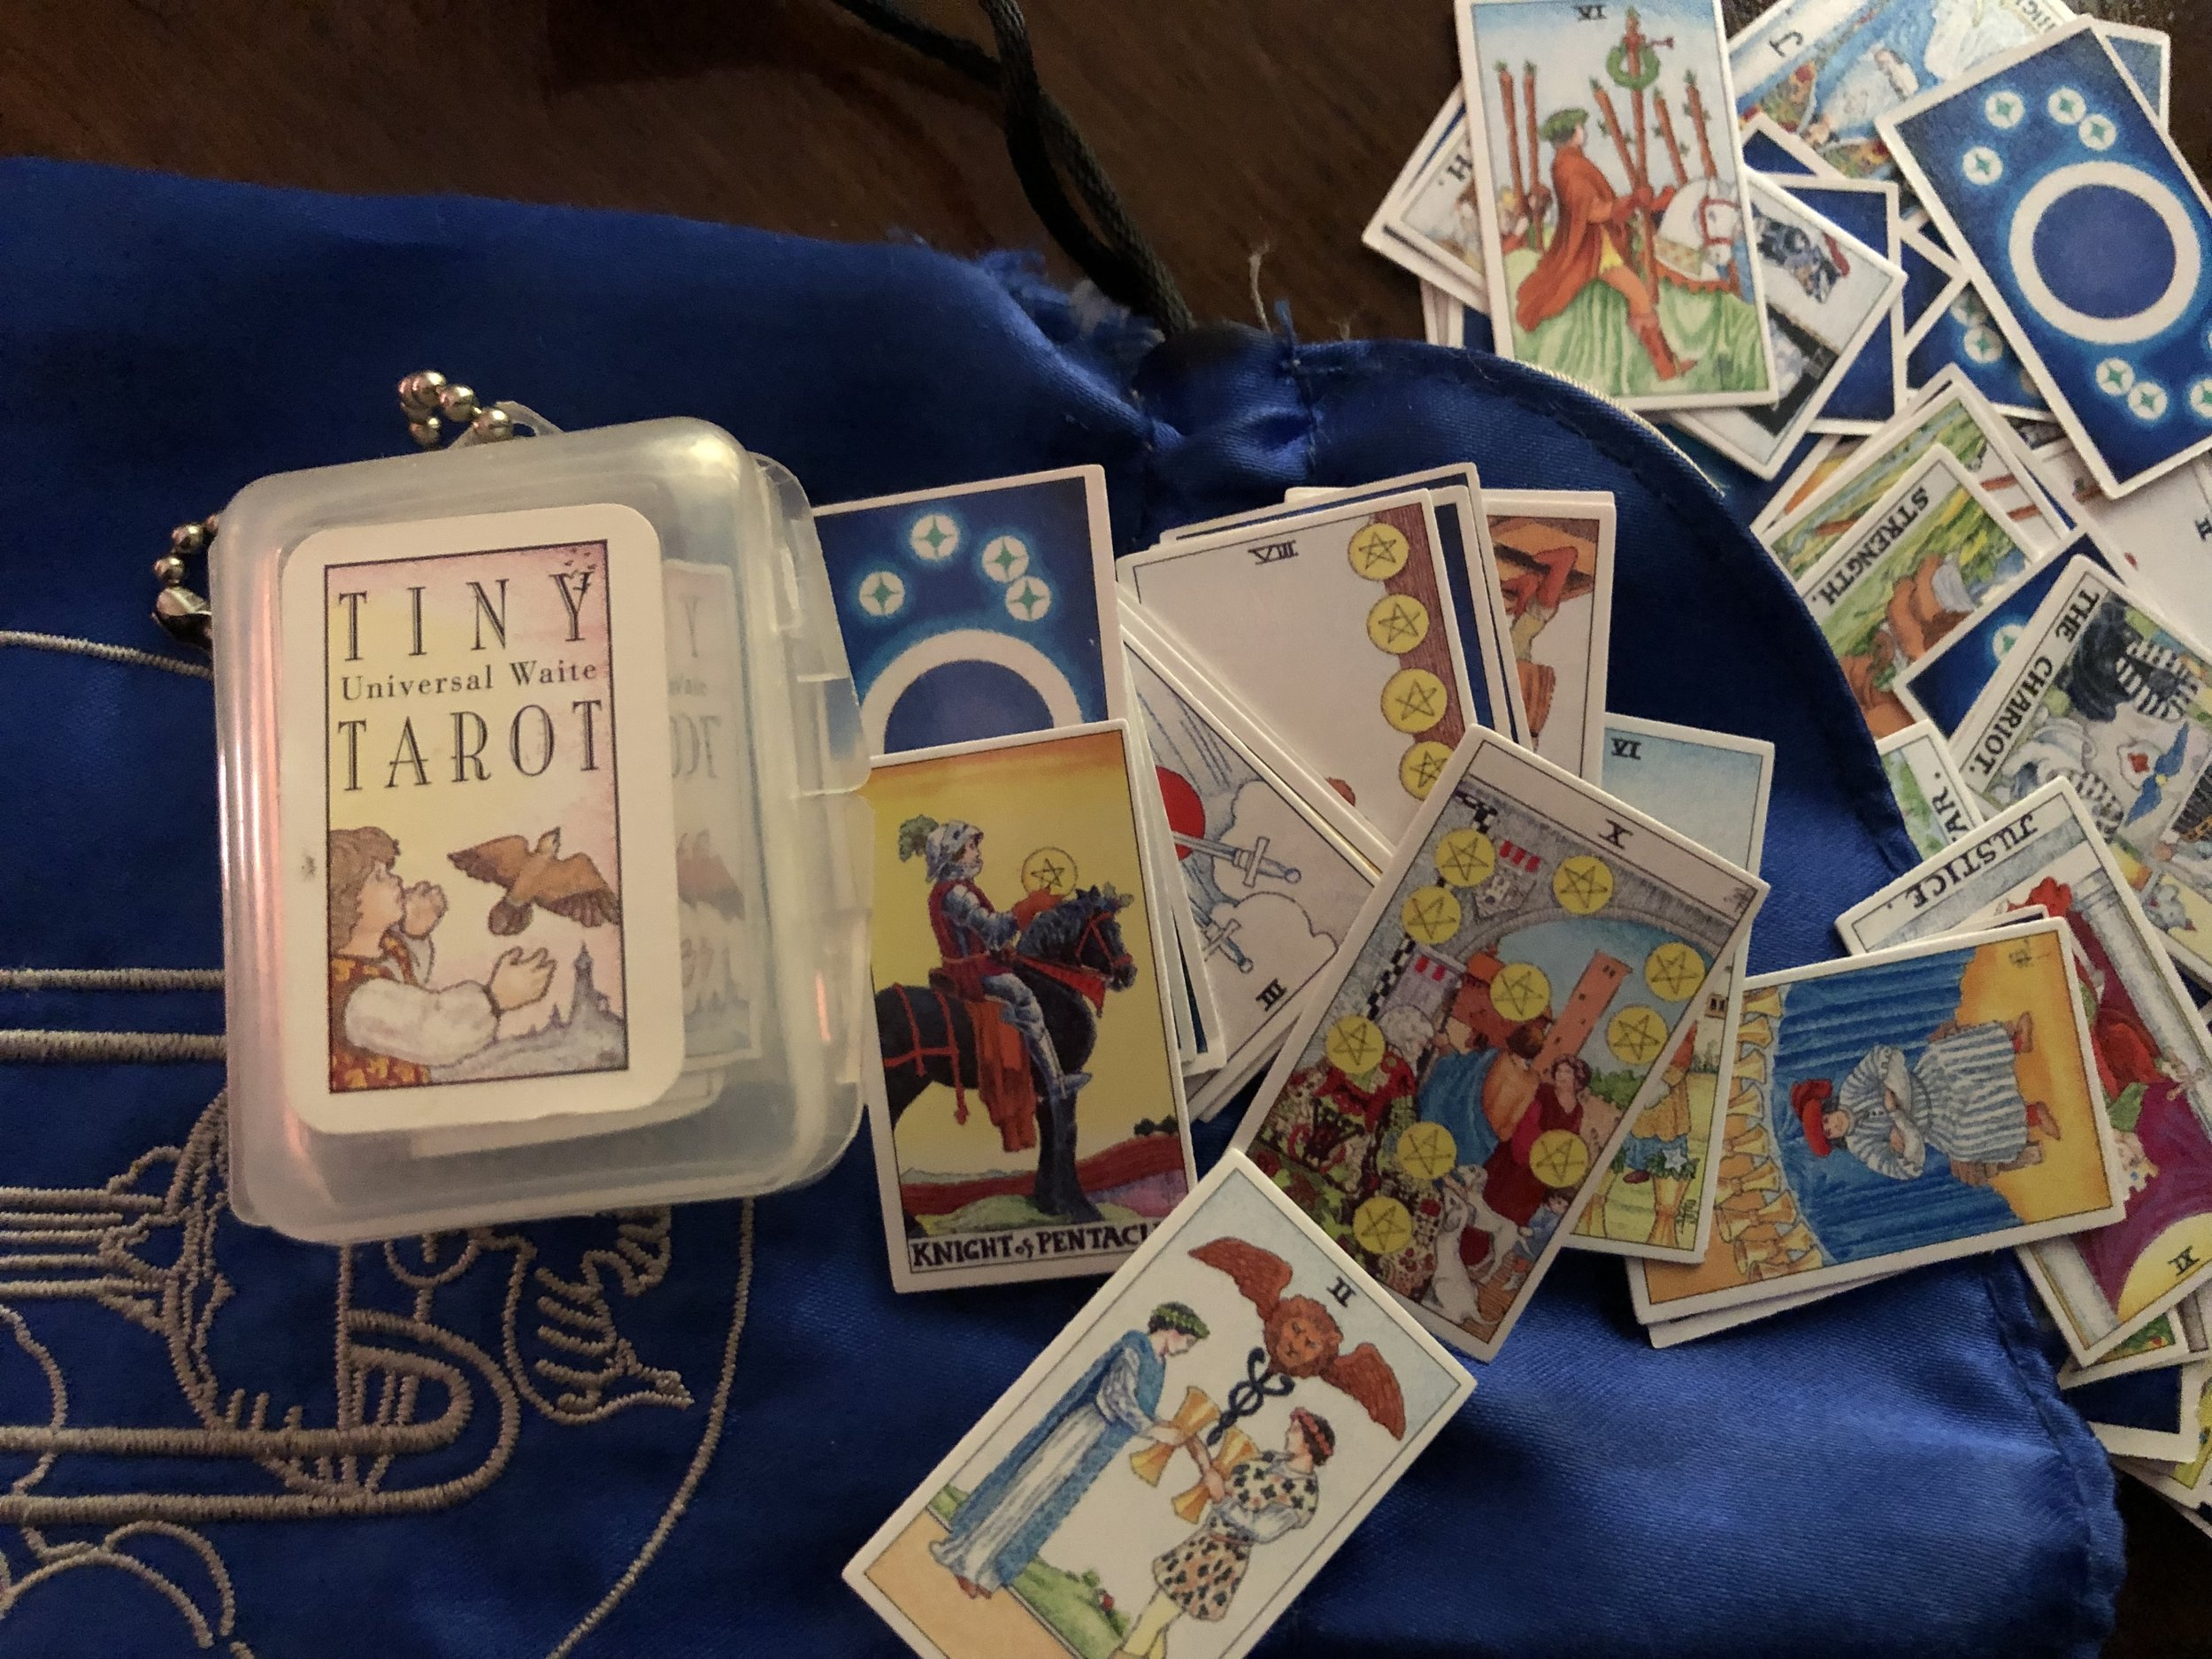 Big Love for Tiny Tarot -